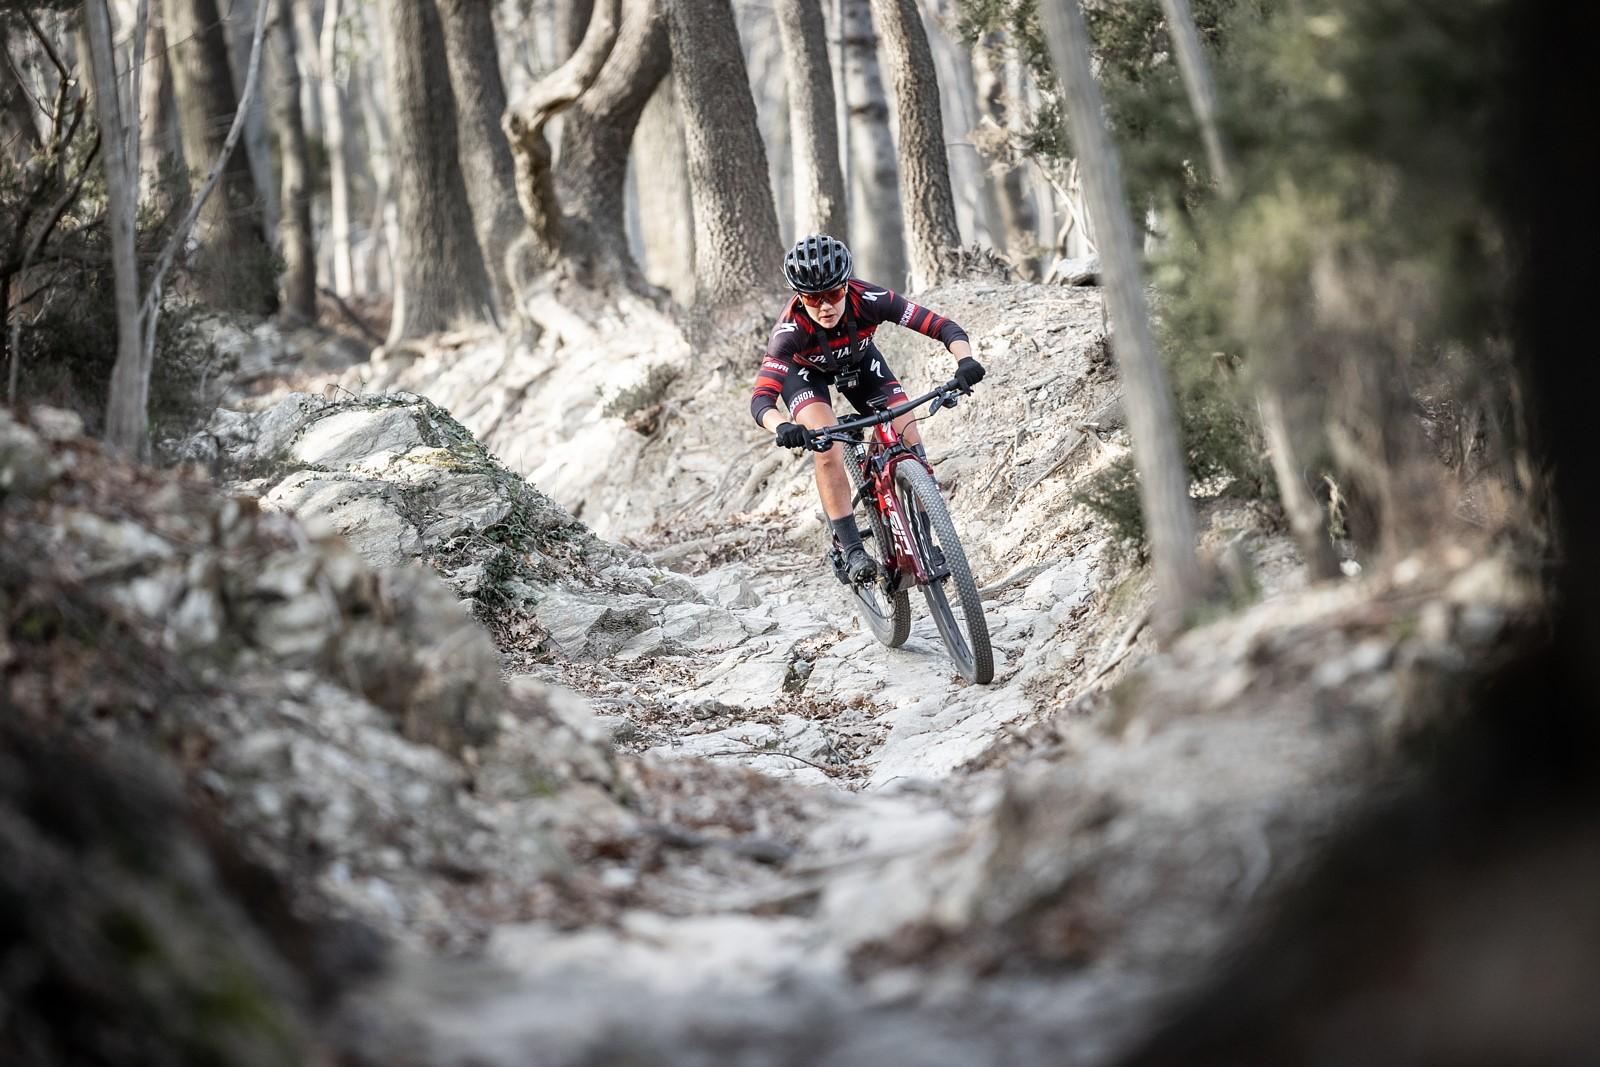 Švýcarská bikerka na trailu v oblasti Ligure. Foto: Michal Červený